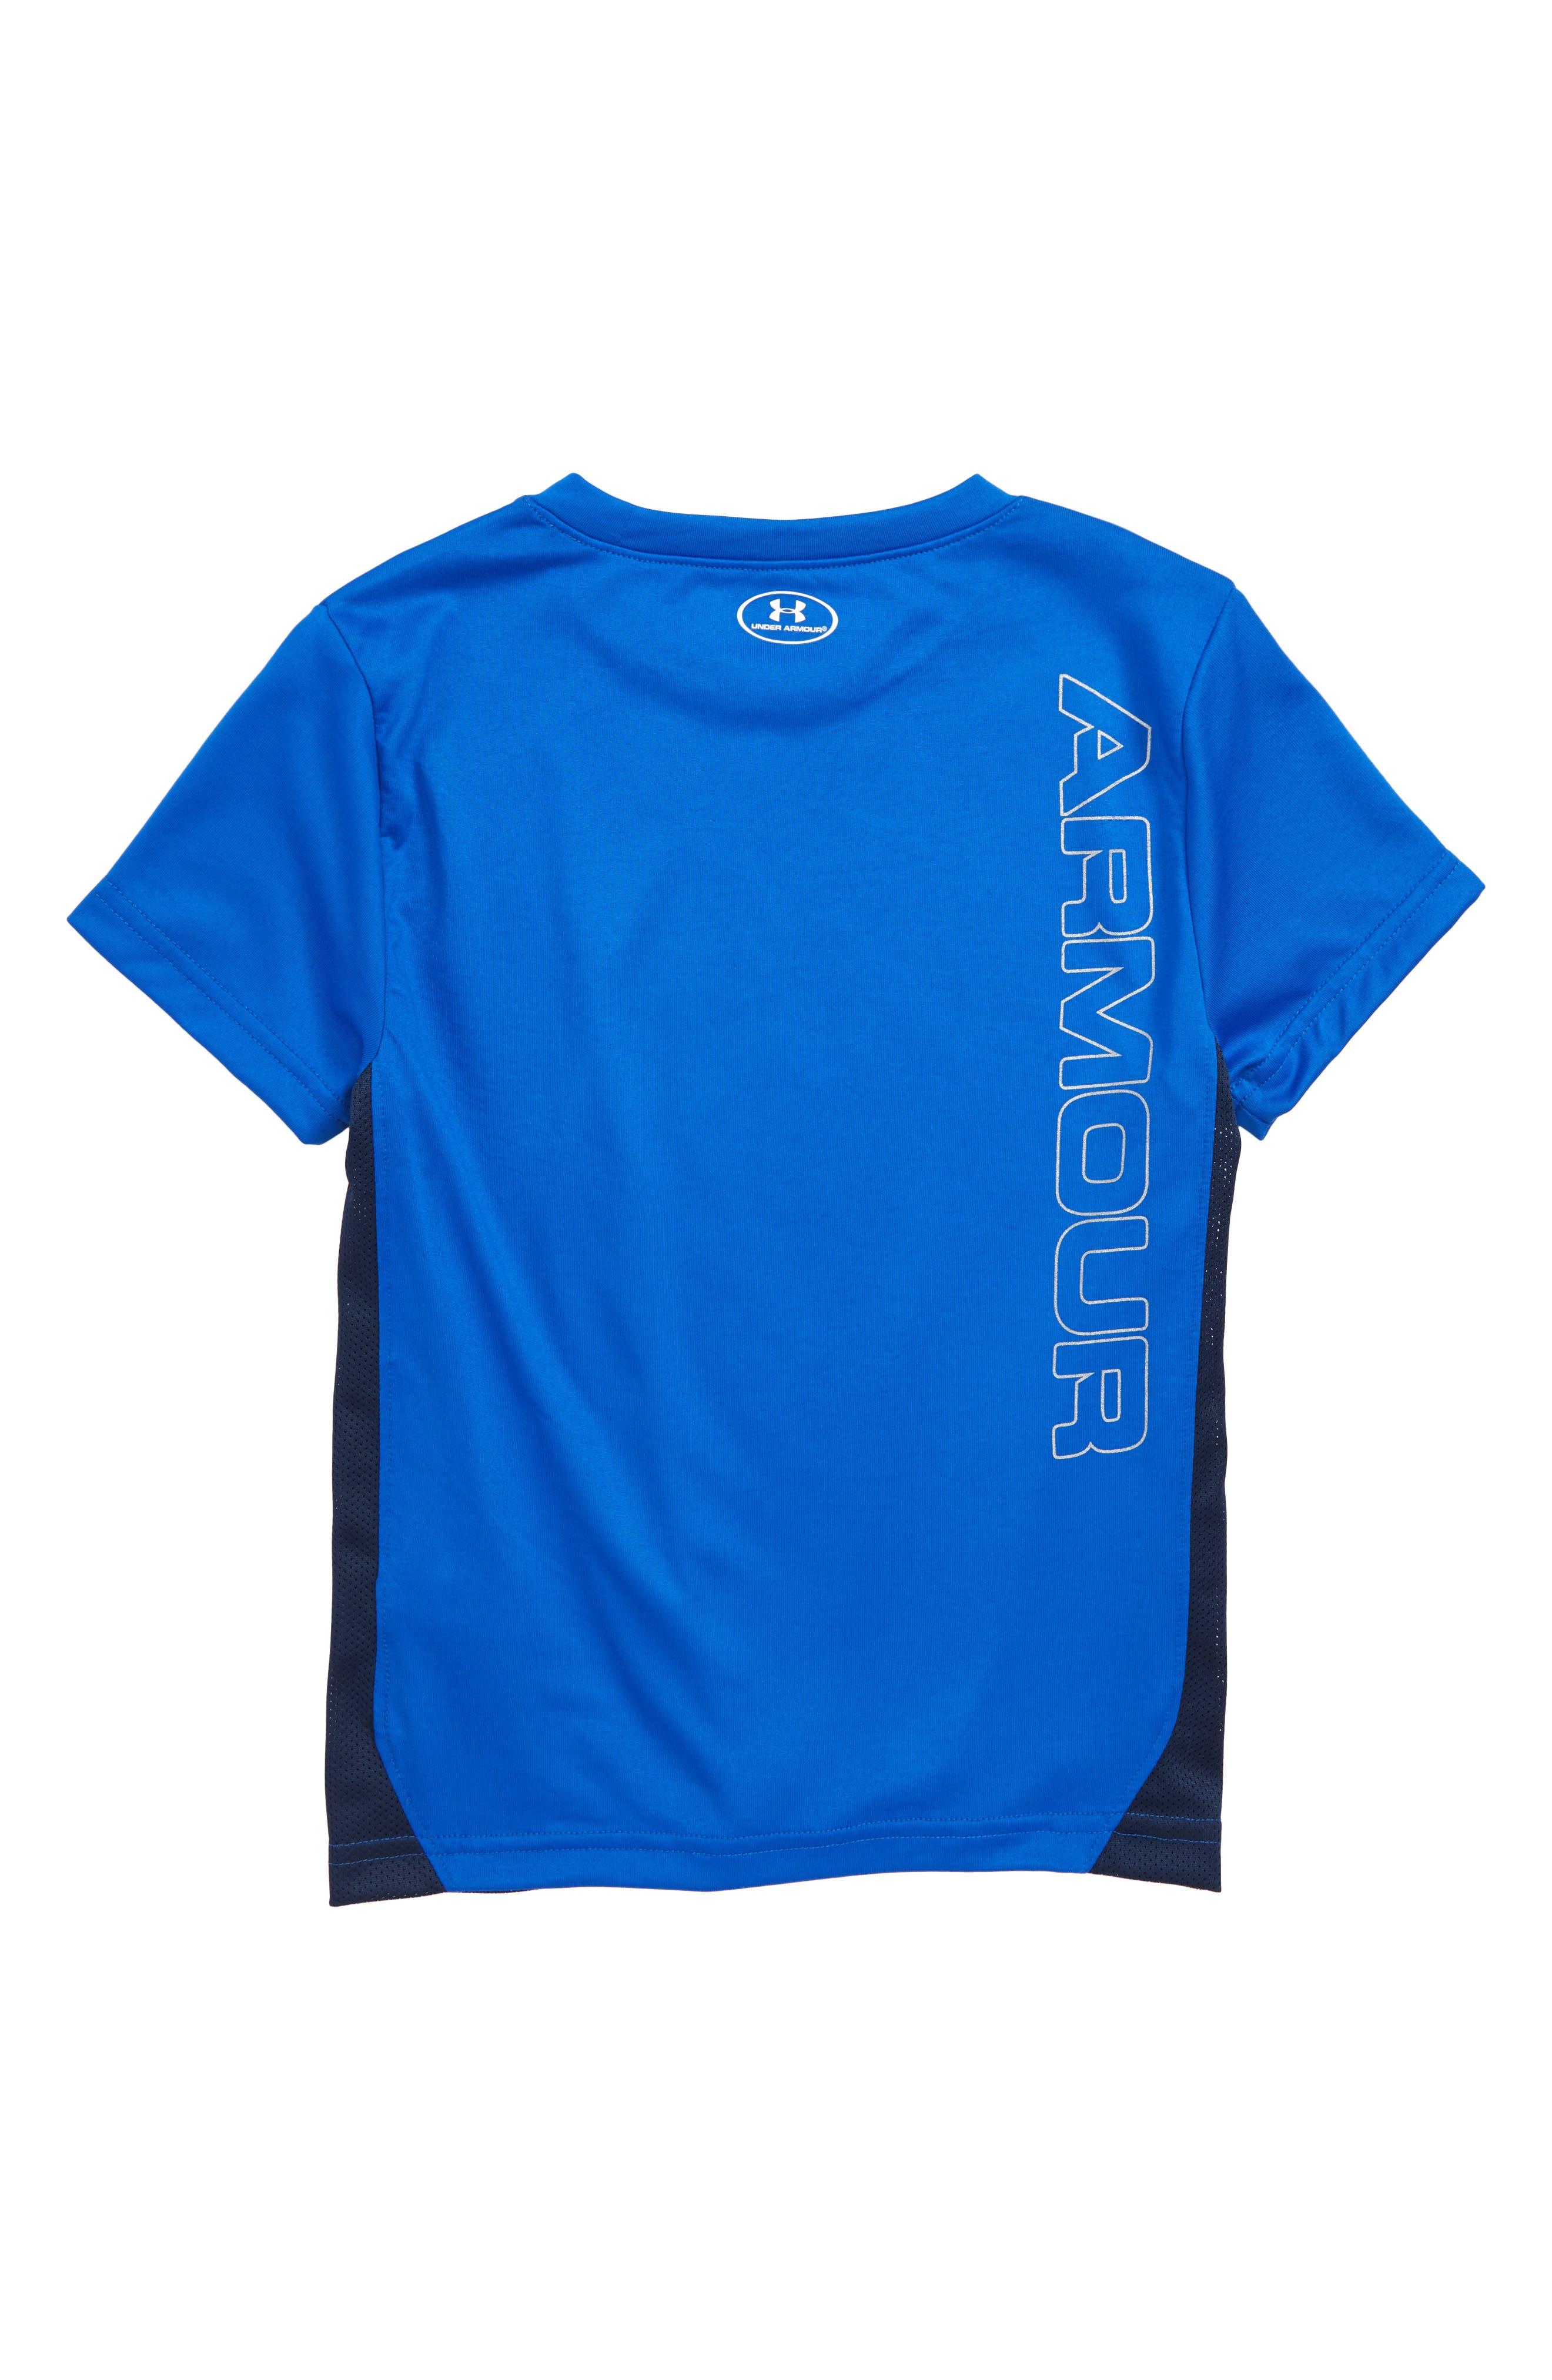 Mesh Tech HeatGear<sup>®</sup> T-Shirt,                             Alternate thumbnail 2, color,                             420